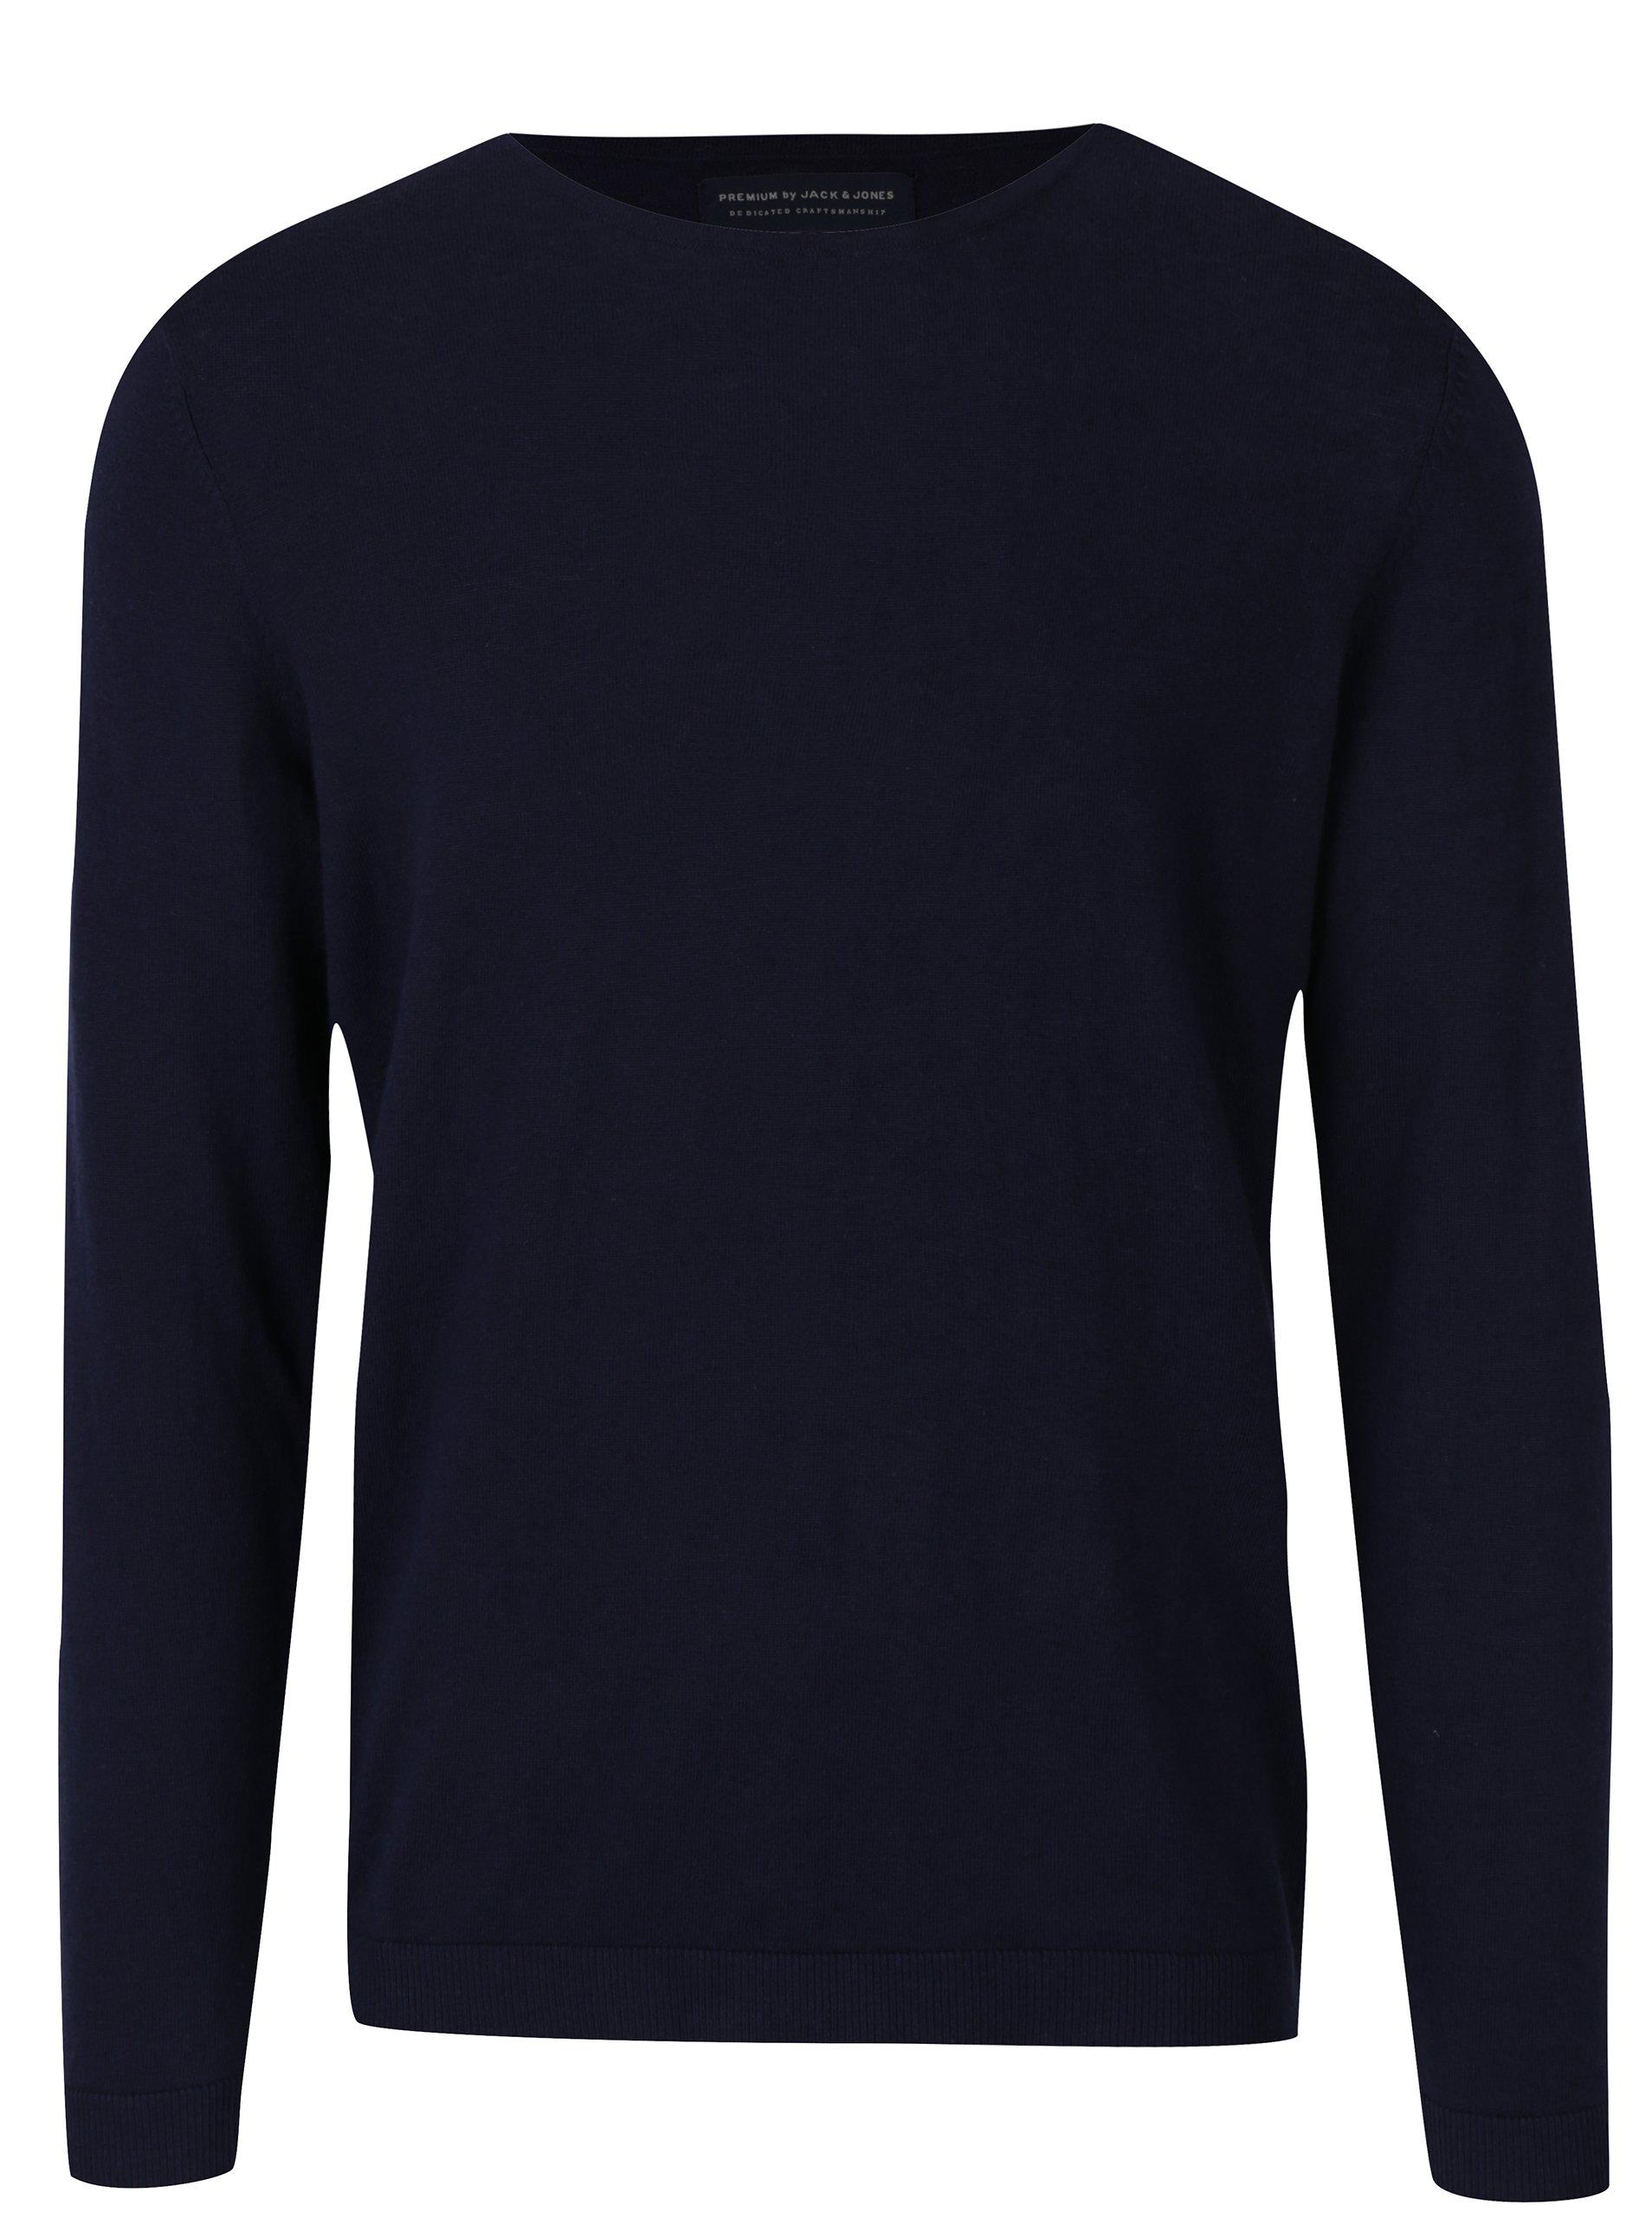 Tmavě modrý lehký svetr Jack & Jones Luke